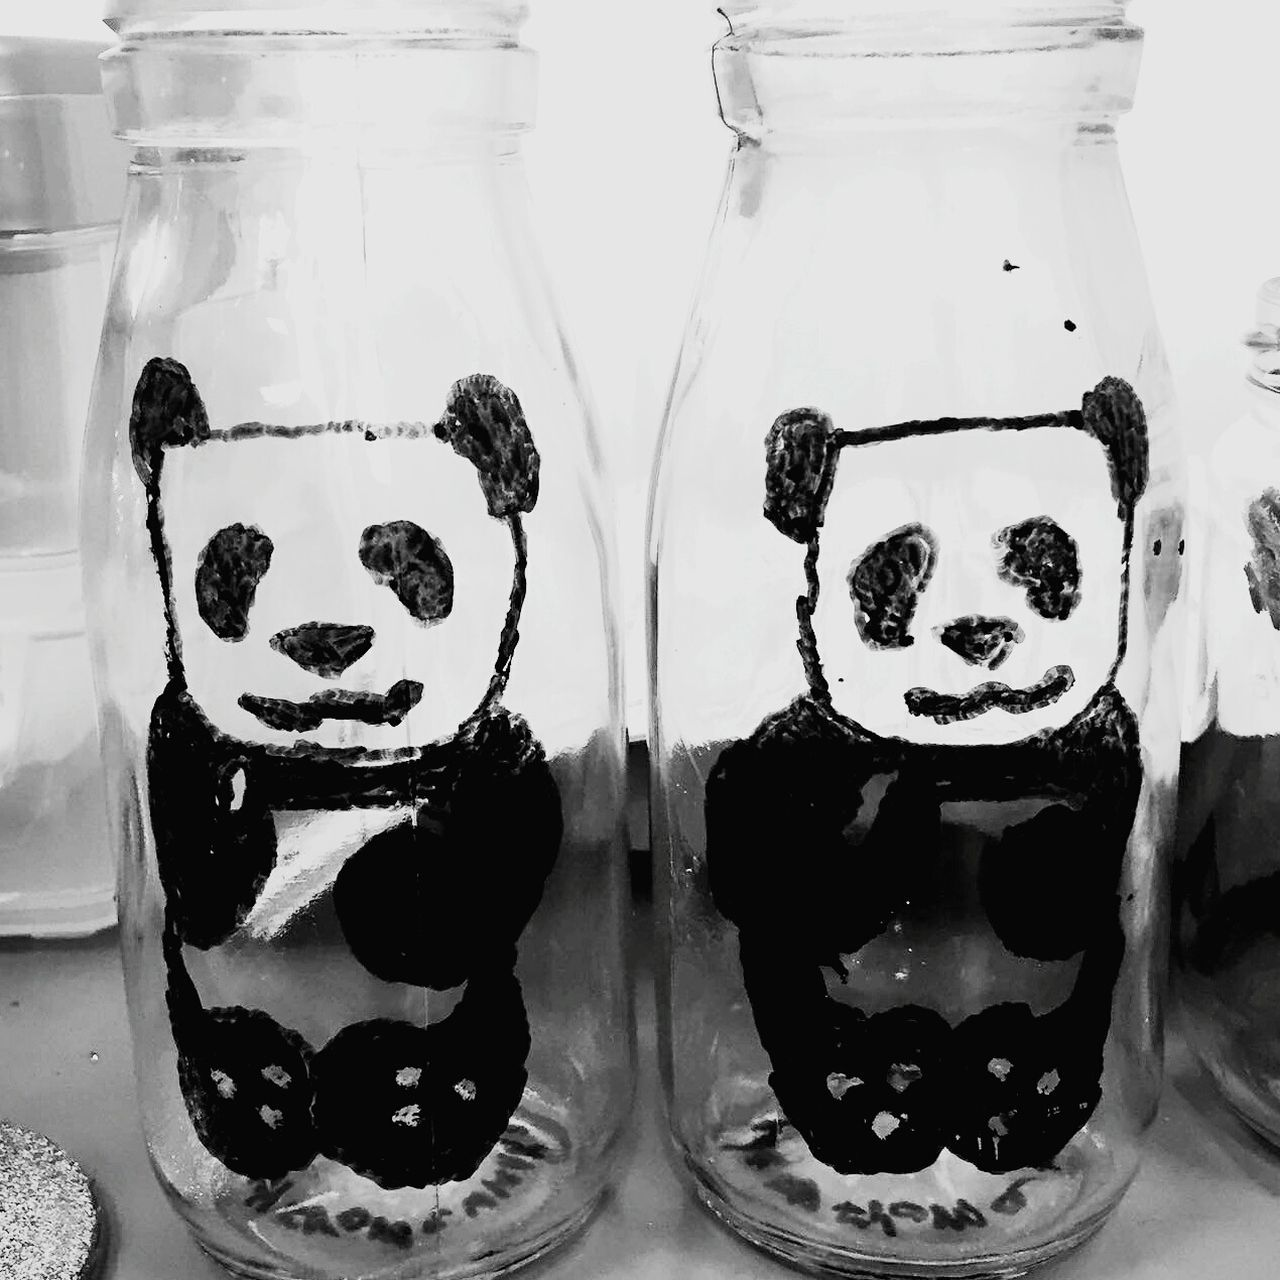 Panda Milkbottles Art Handmade Drawnbymouth Blackandwhite Pandamilkbottles Check This Out Art Fromablankcanvas Smallbusiness